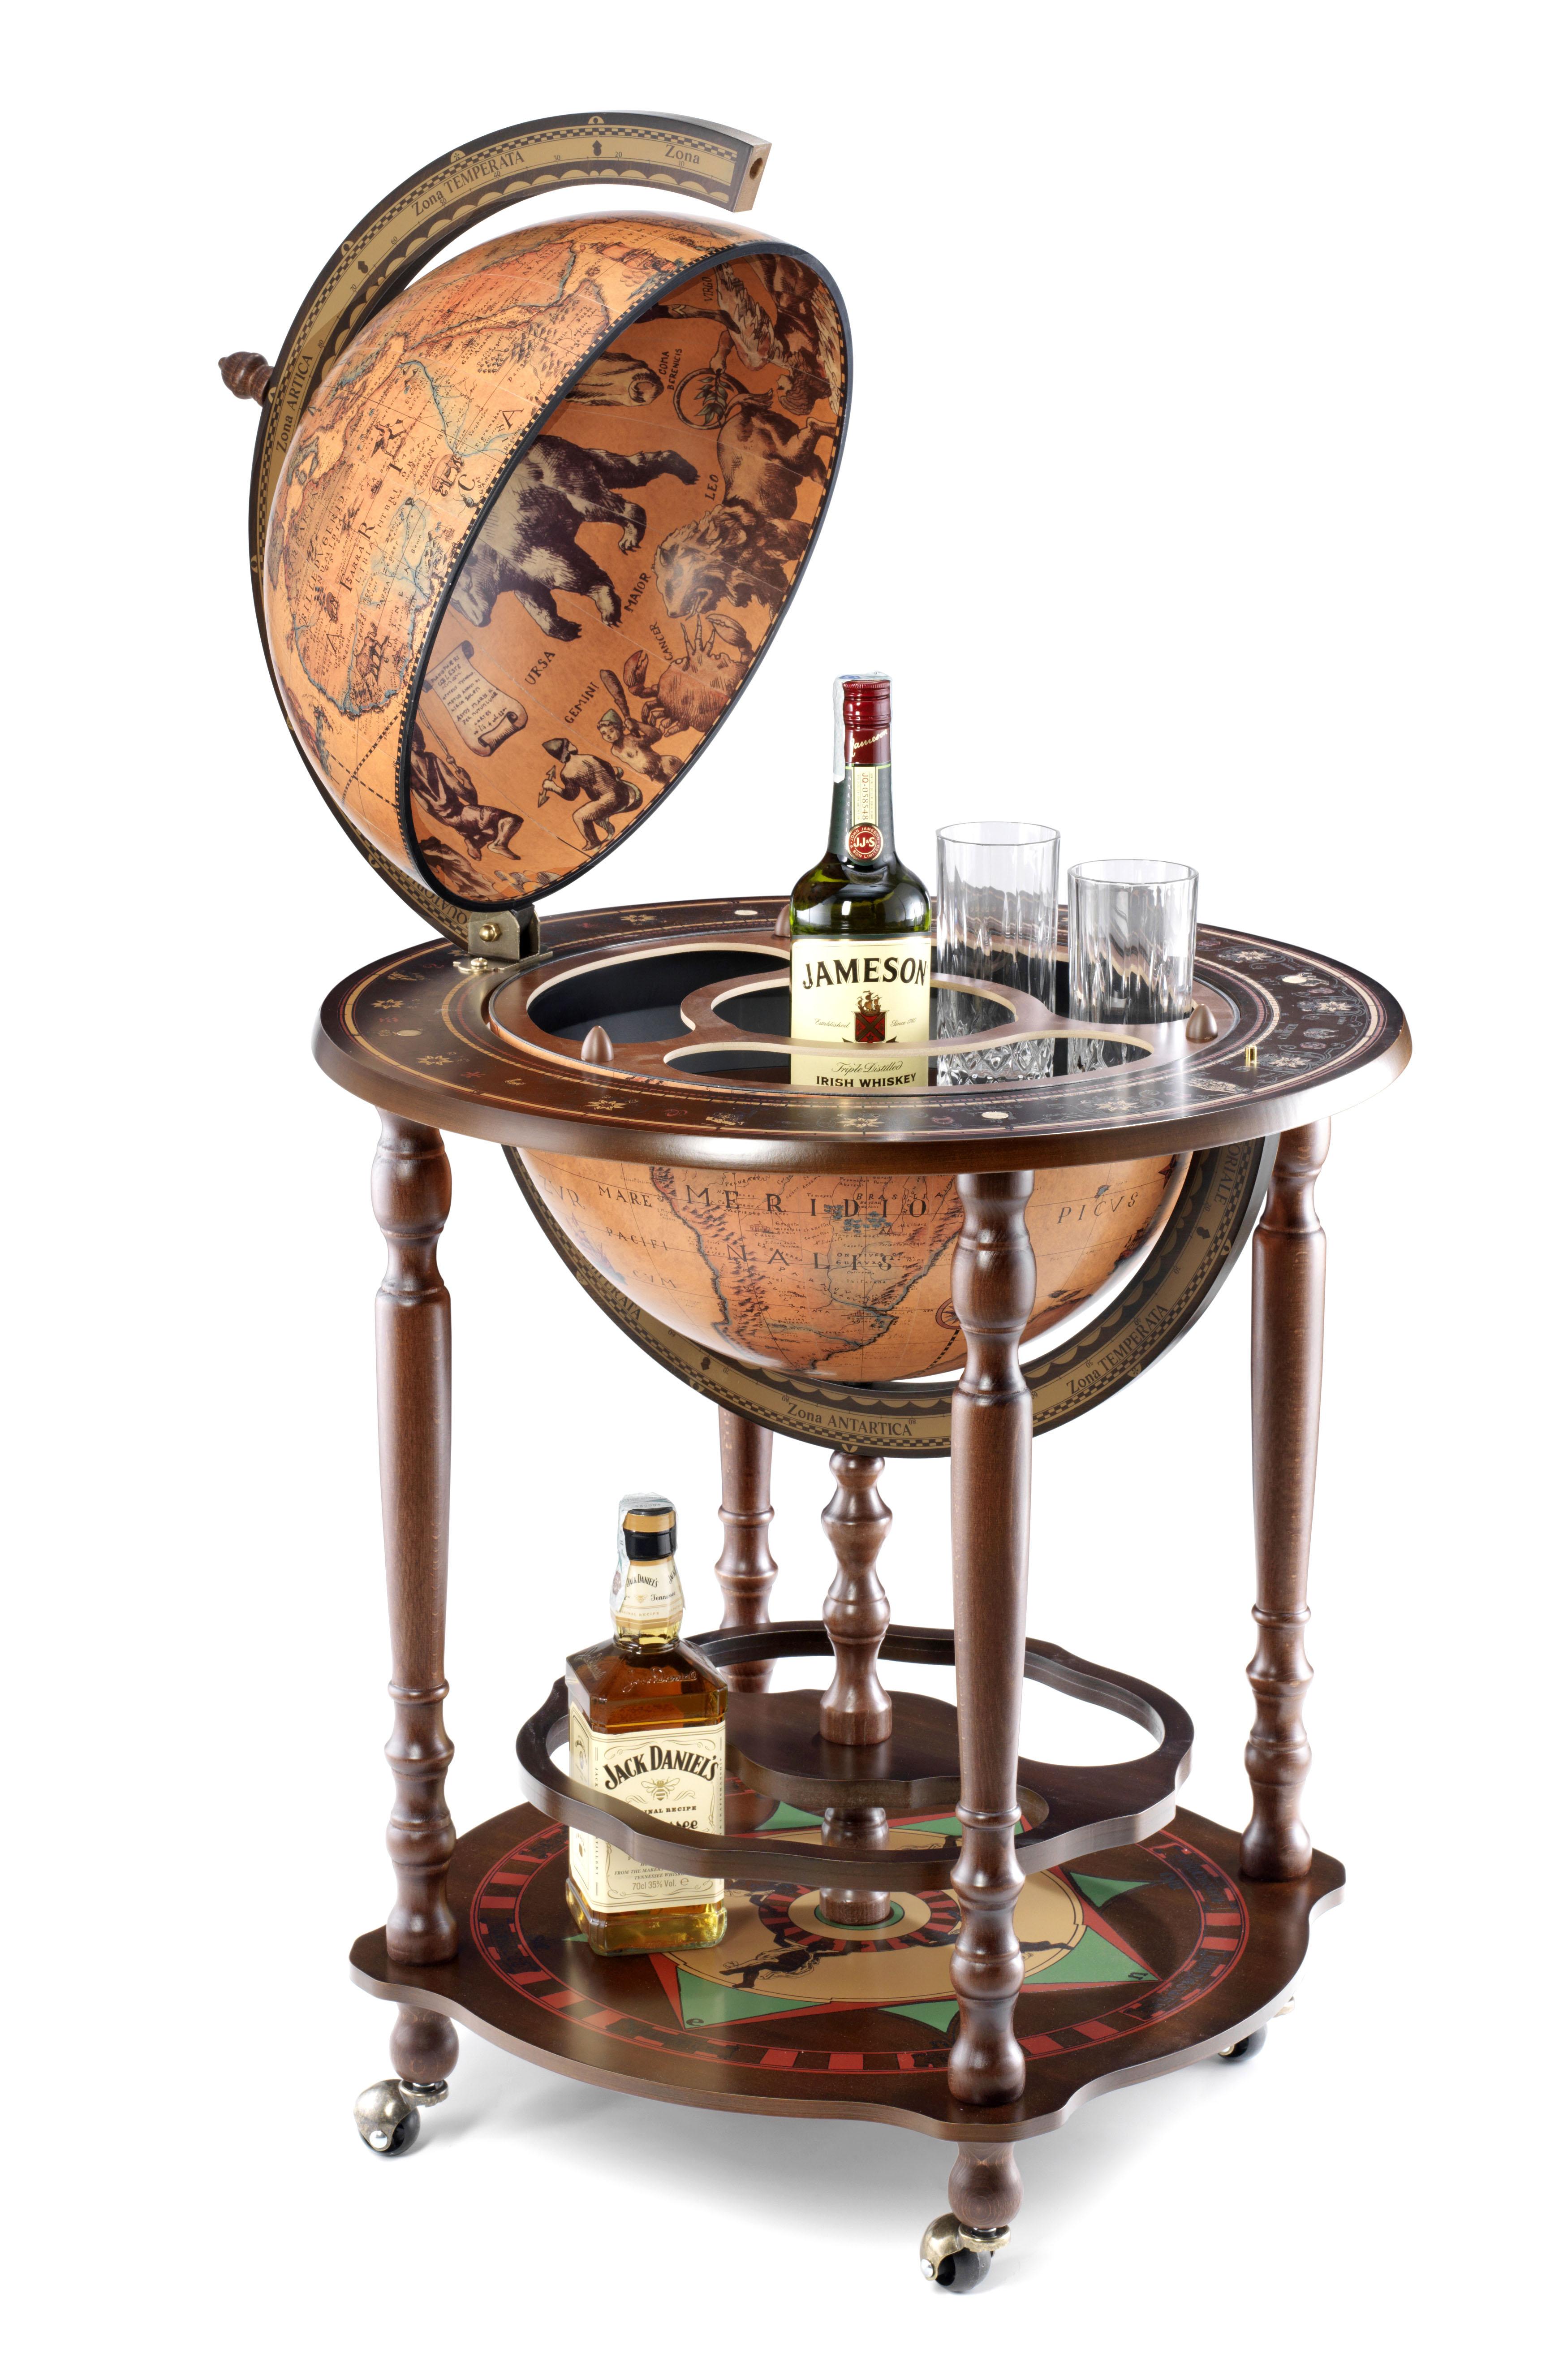 Minosse bar globe 40 Classic - 16e-eeuwse kaart